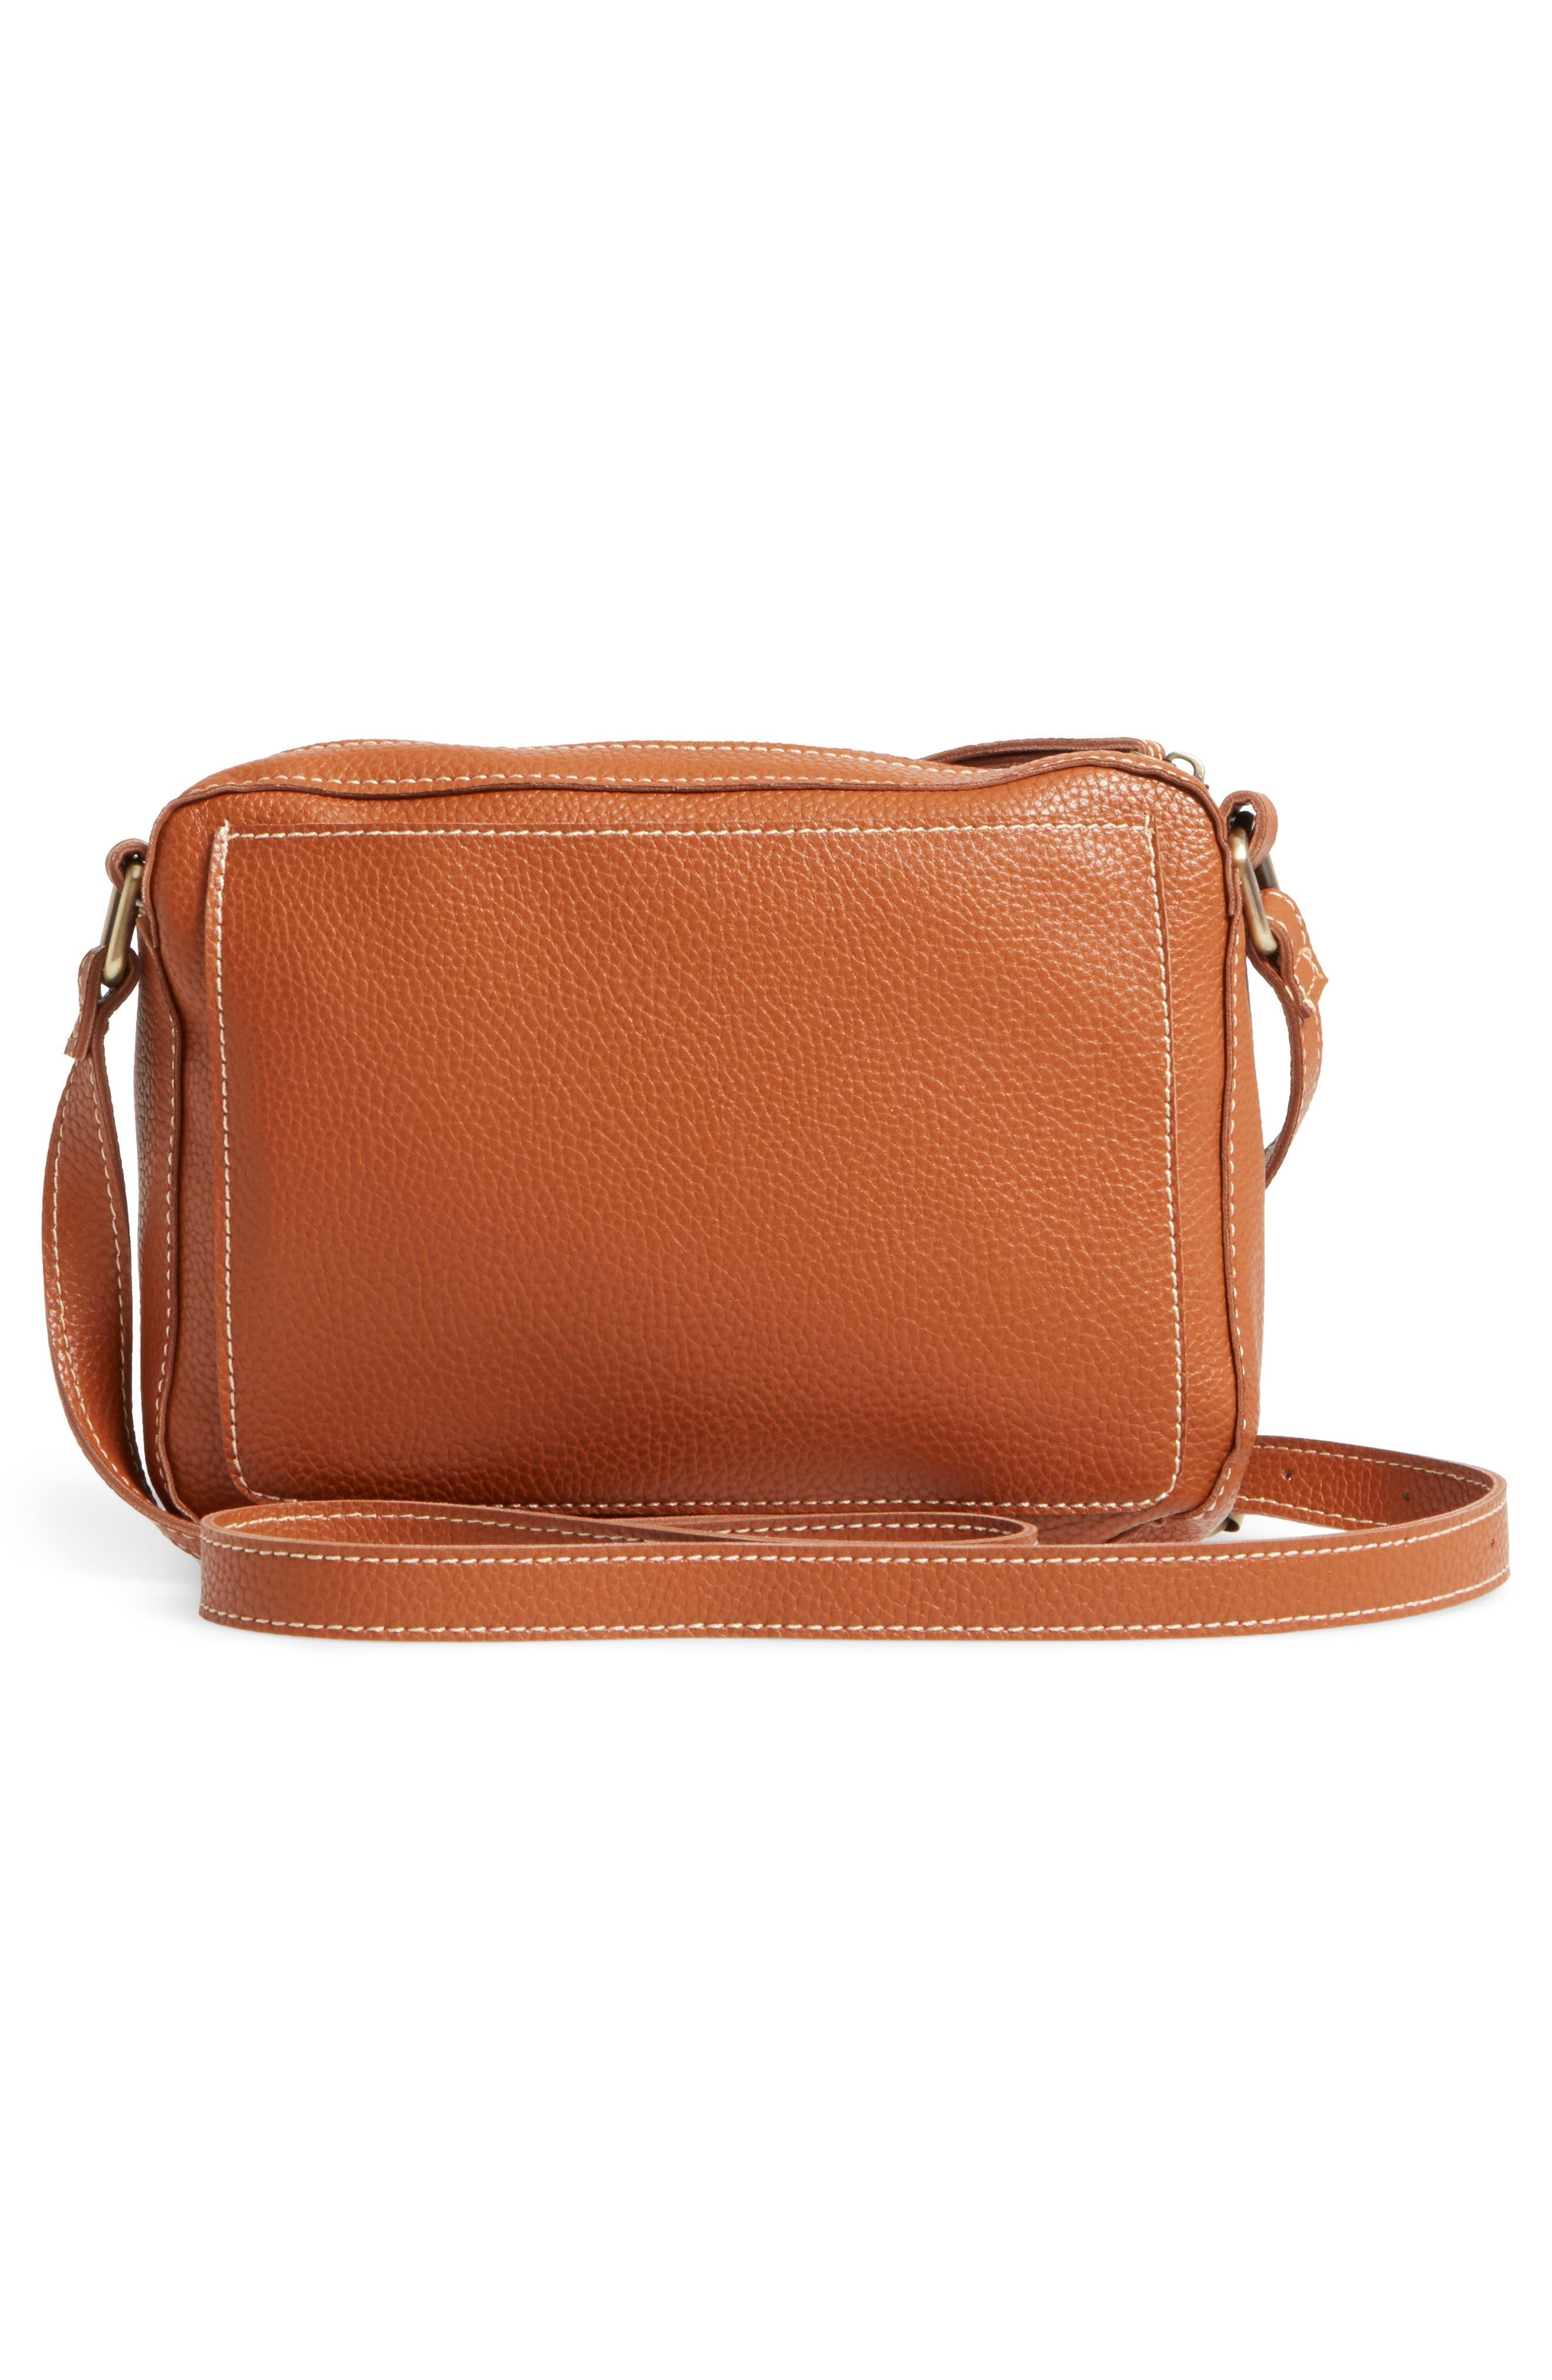 Skylar Faux Leather Crossbody Bag,                             Alternate thumbnail 3, color,                             211